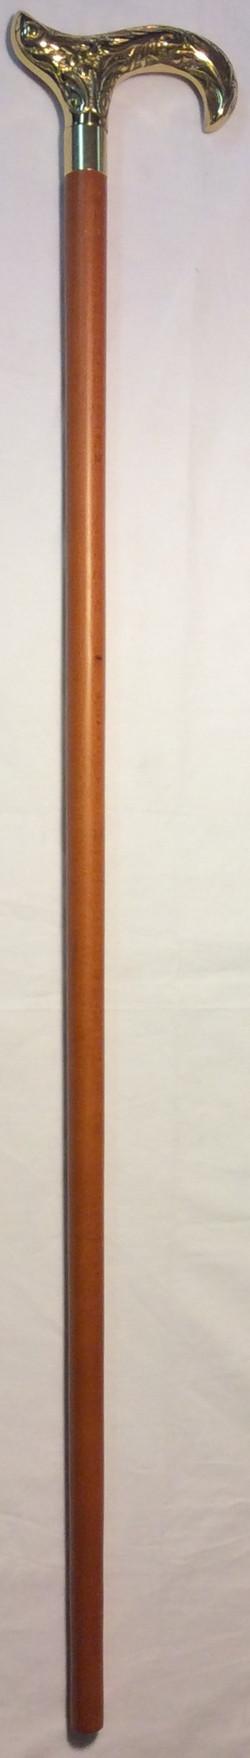 Caramel wooden cane, heavy ornate